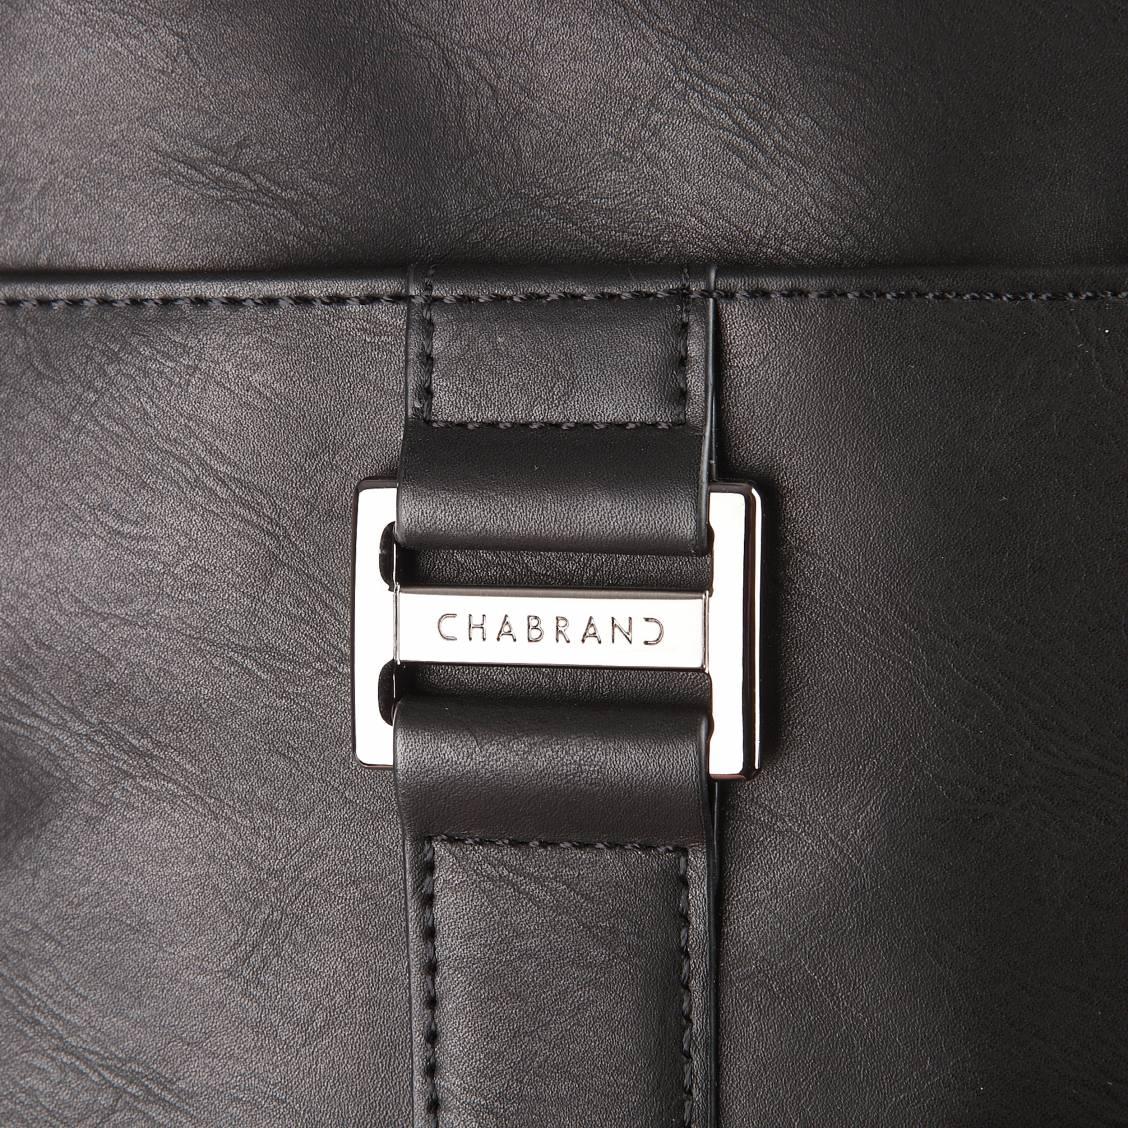 sacoche zipp e lima chabrand en simili cuir noir rue des hommes. Black Bedroom Furniture Sets. Home Design Ideas